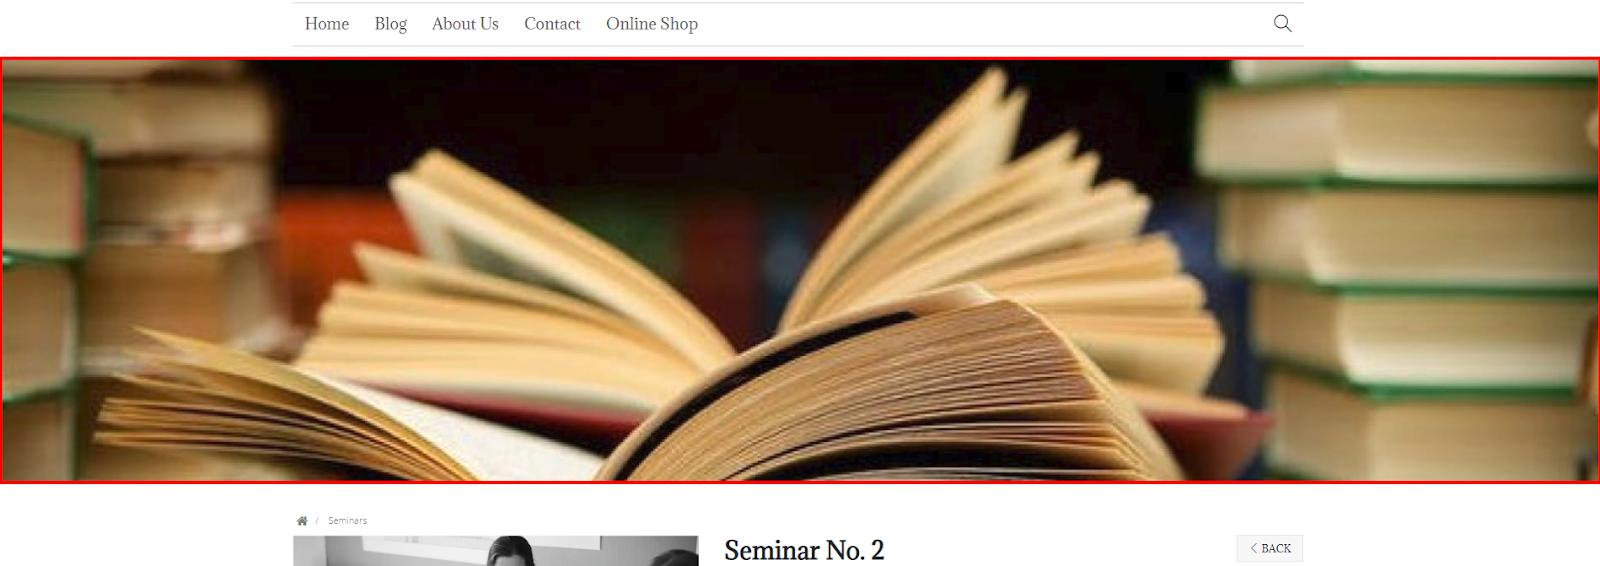 Seminar No 2